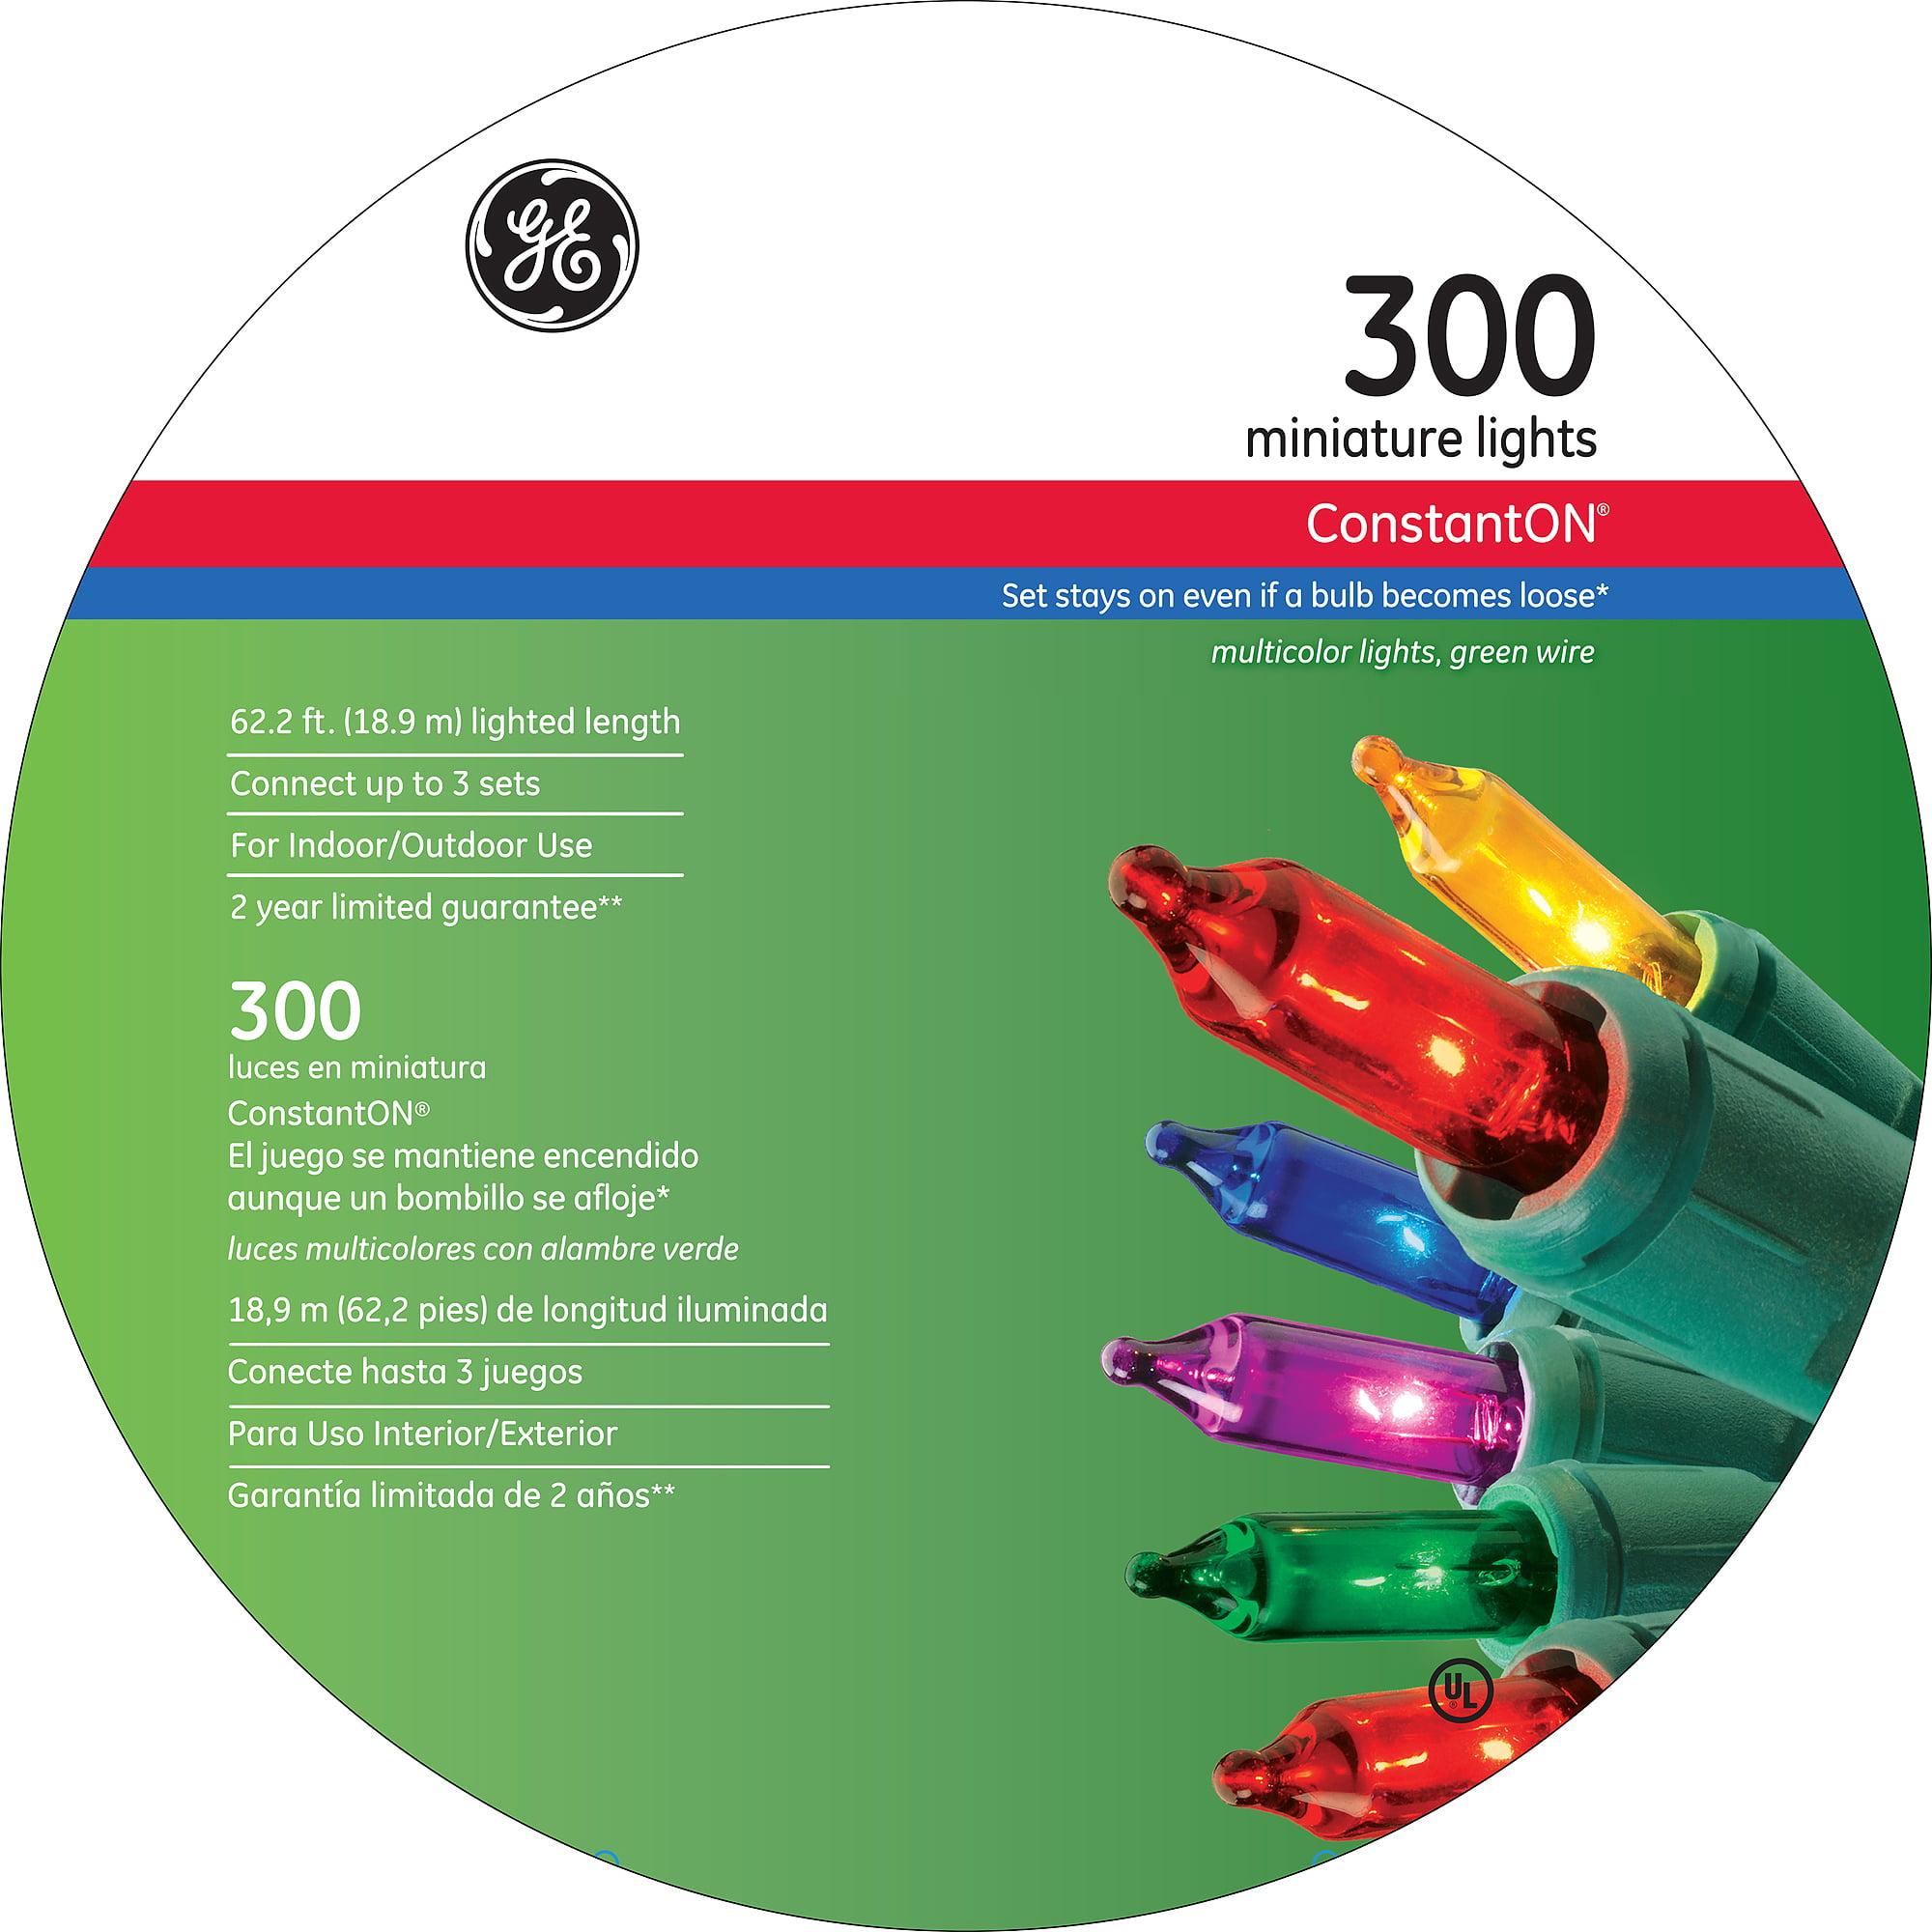 GE ConstantON Multi-Colored Miniature String Set, 300 Count